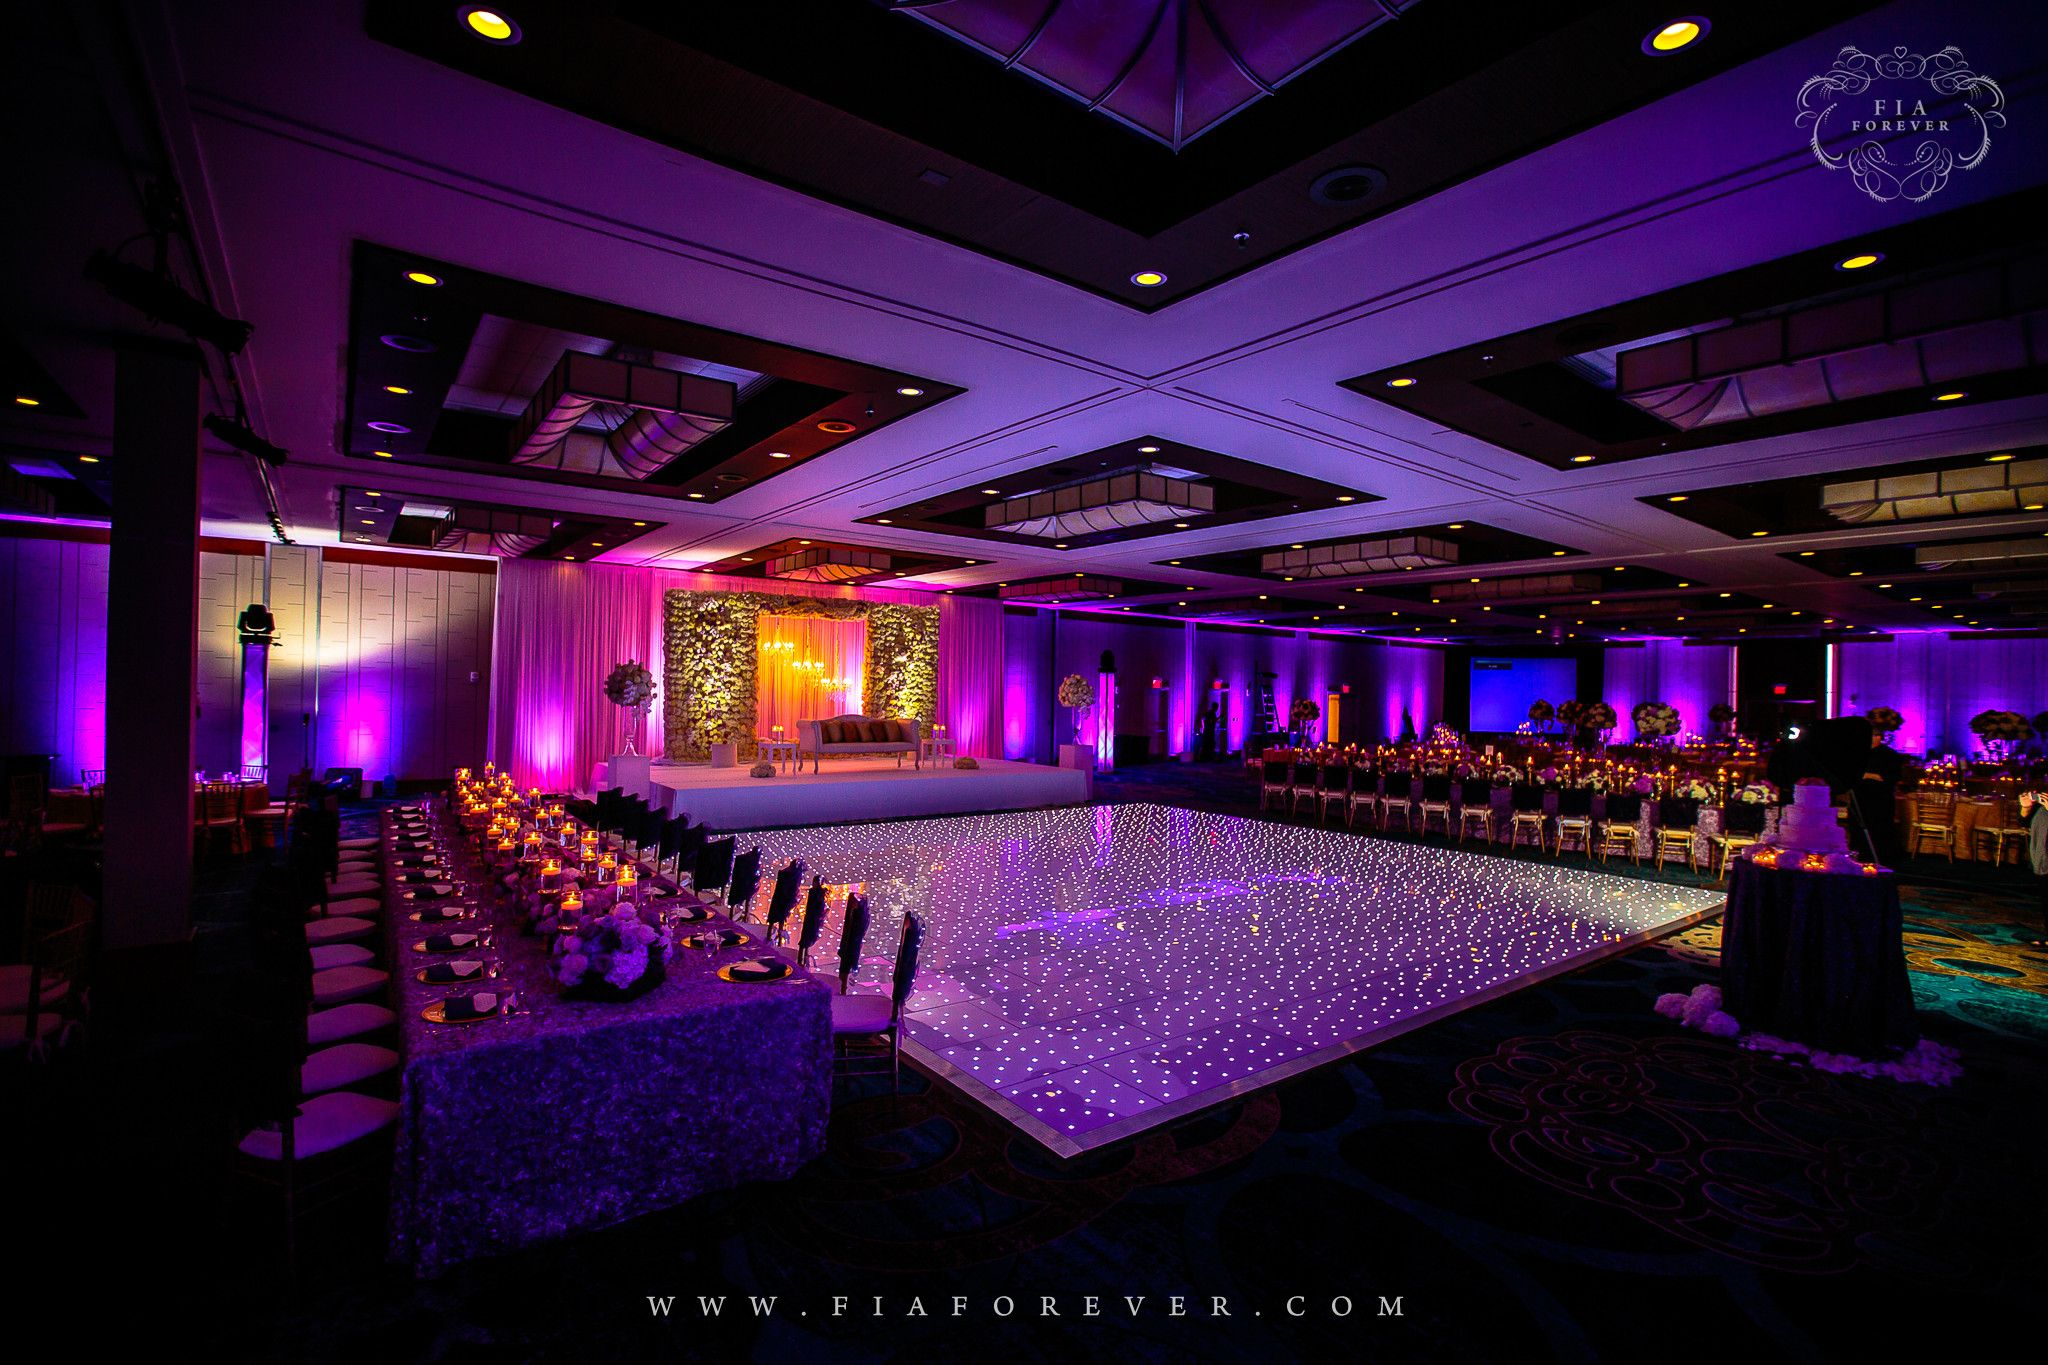 Wedding reception decor ideas luxury weddings gold purple wedding reception decor ideas luxury weddings gold purple indian wedding decor ideas junglespirit Choice Image